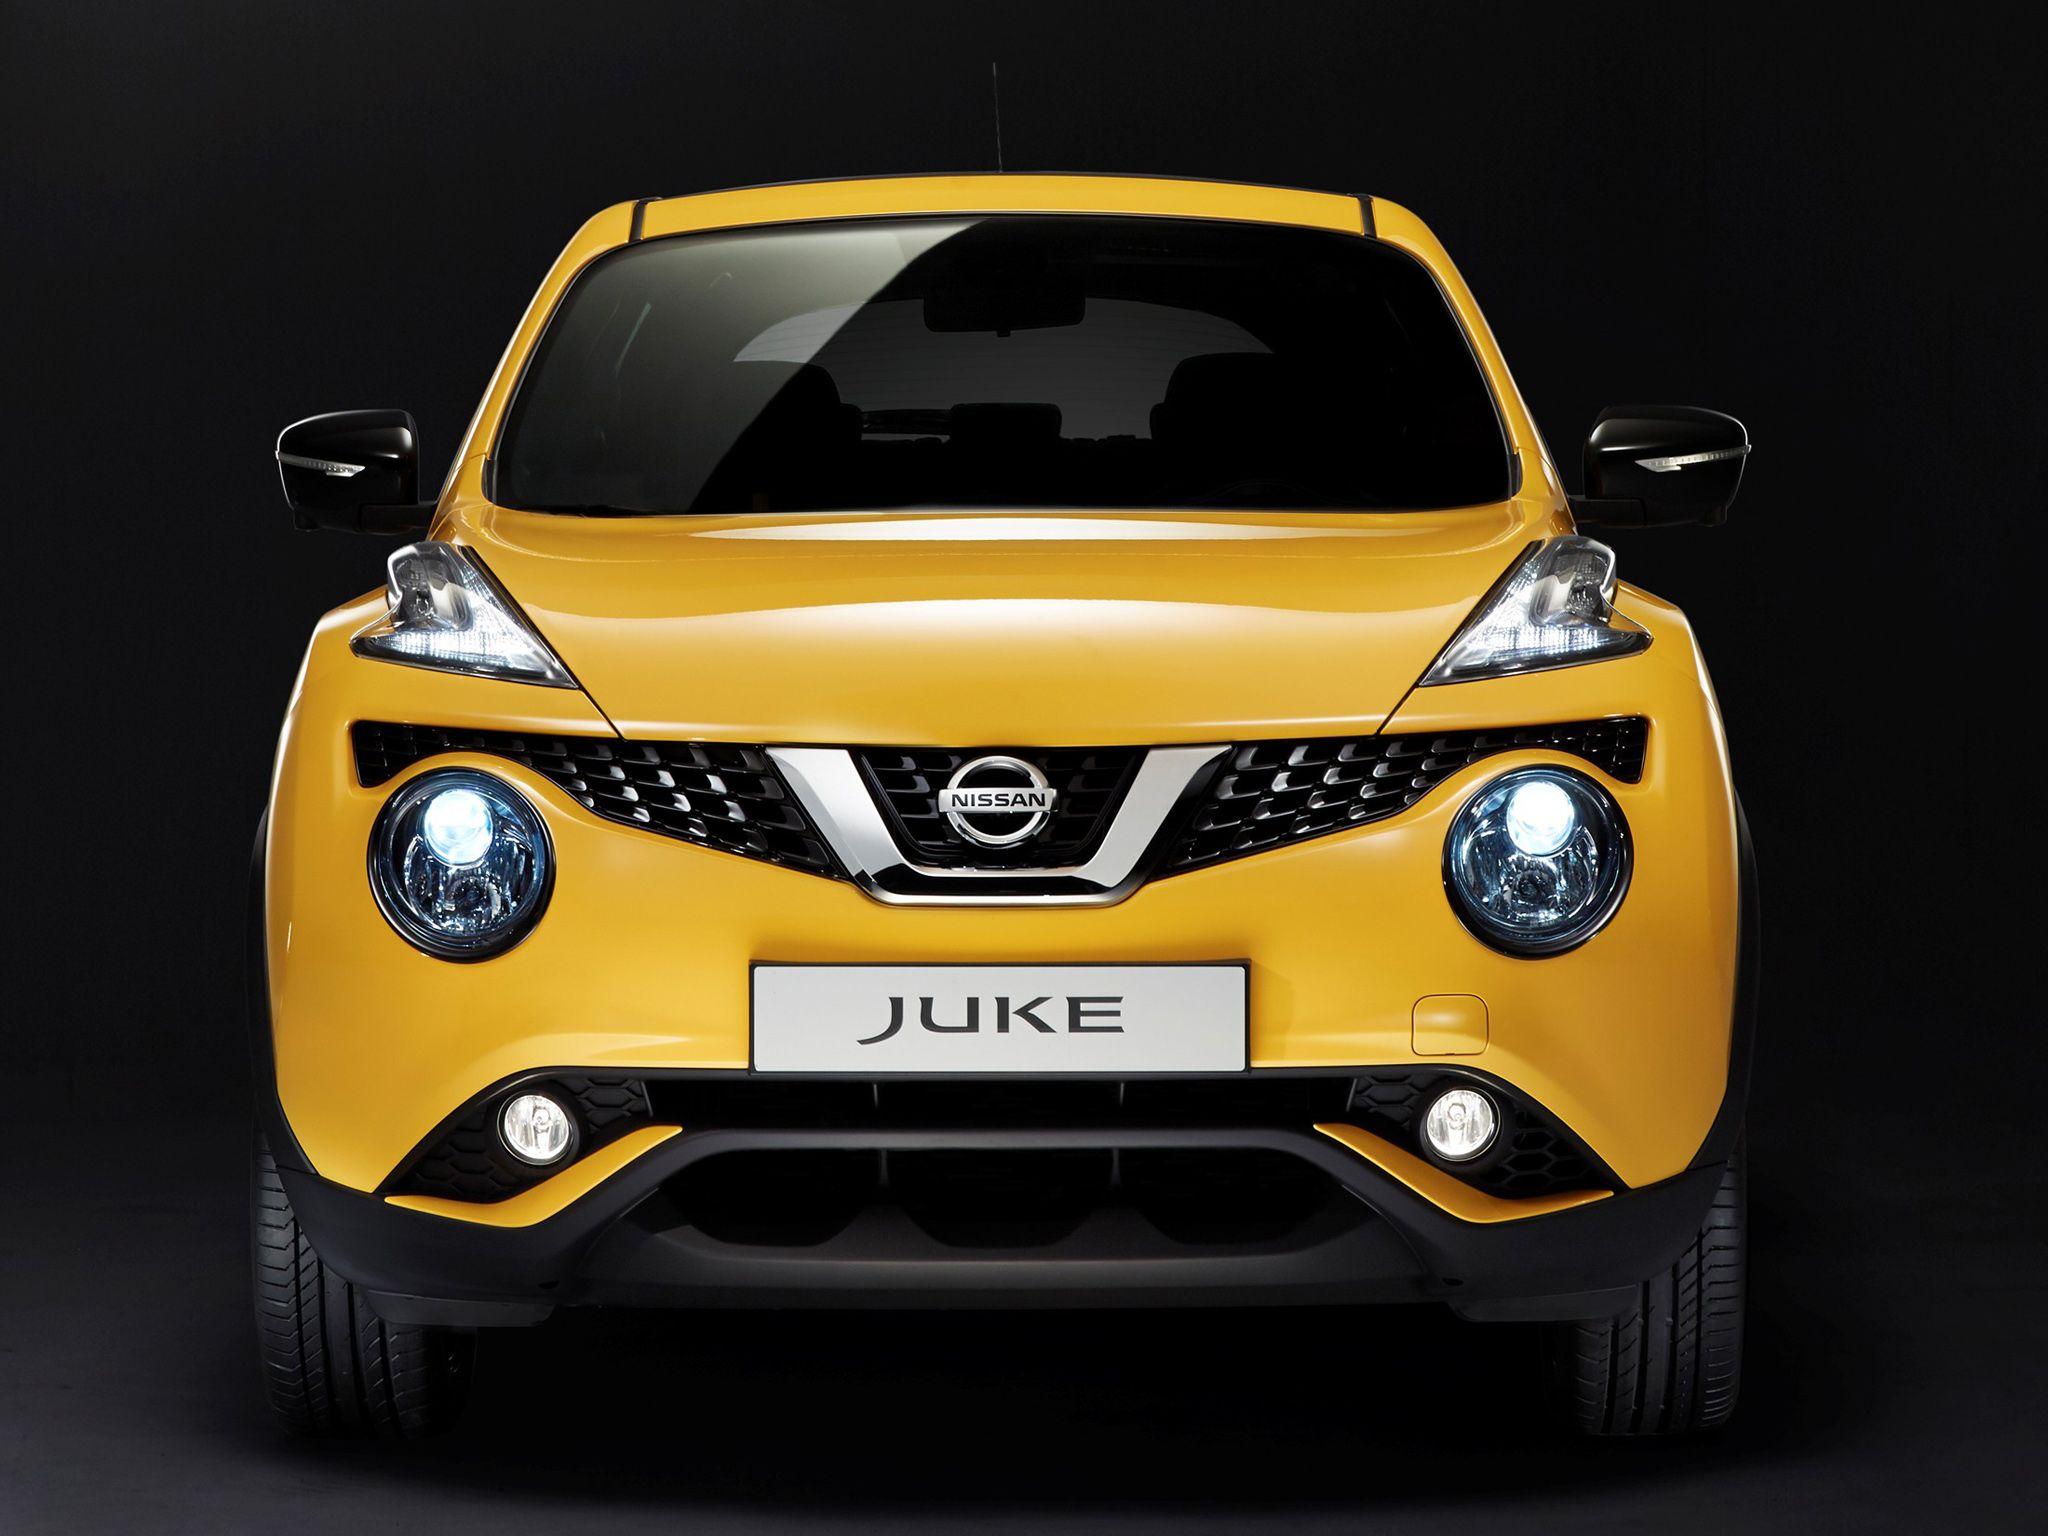 Nissan Juke (YF15) '2014 Nissan juke, Nissan, Modelauto